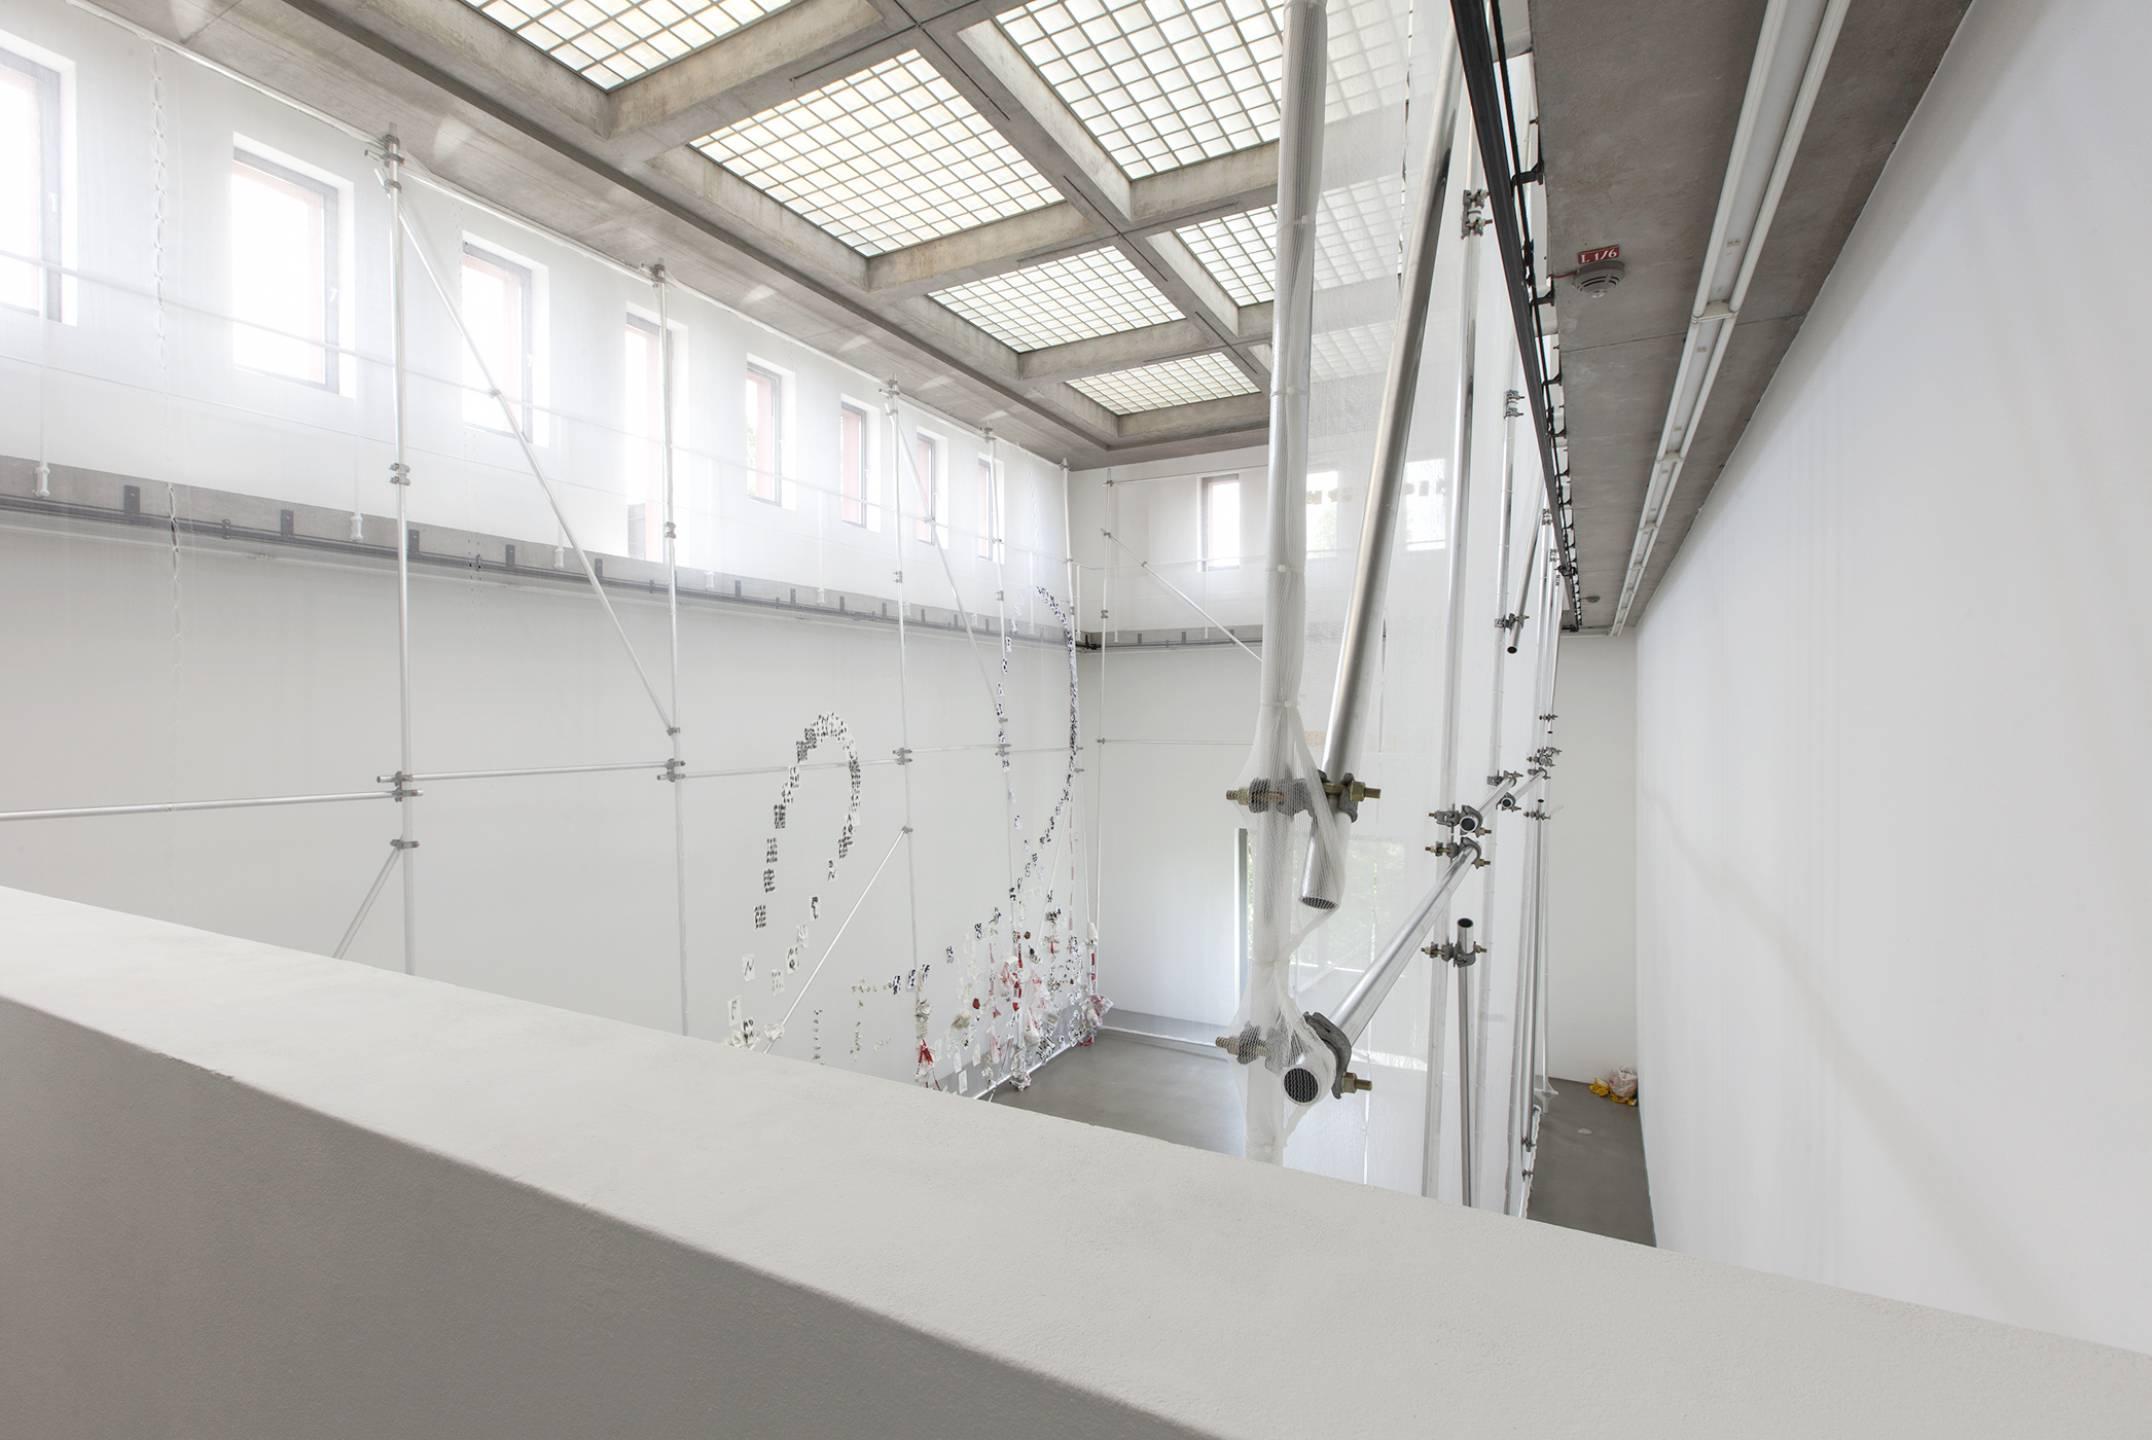 Michael Dean,<em>Teaxths and Angeruage</em>,Portikus, Frankfurt, 2017 - Mendes Wood DM